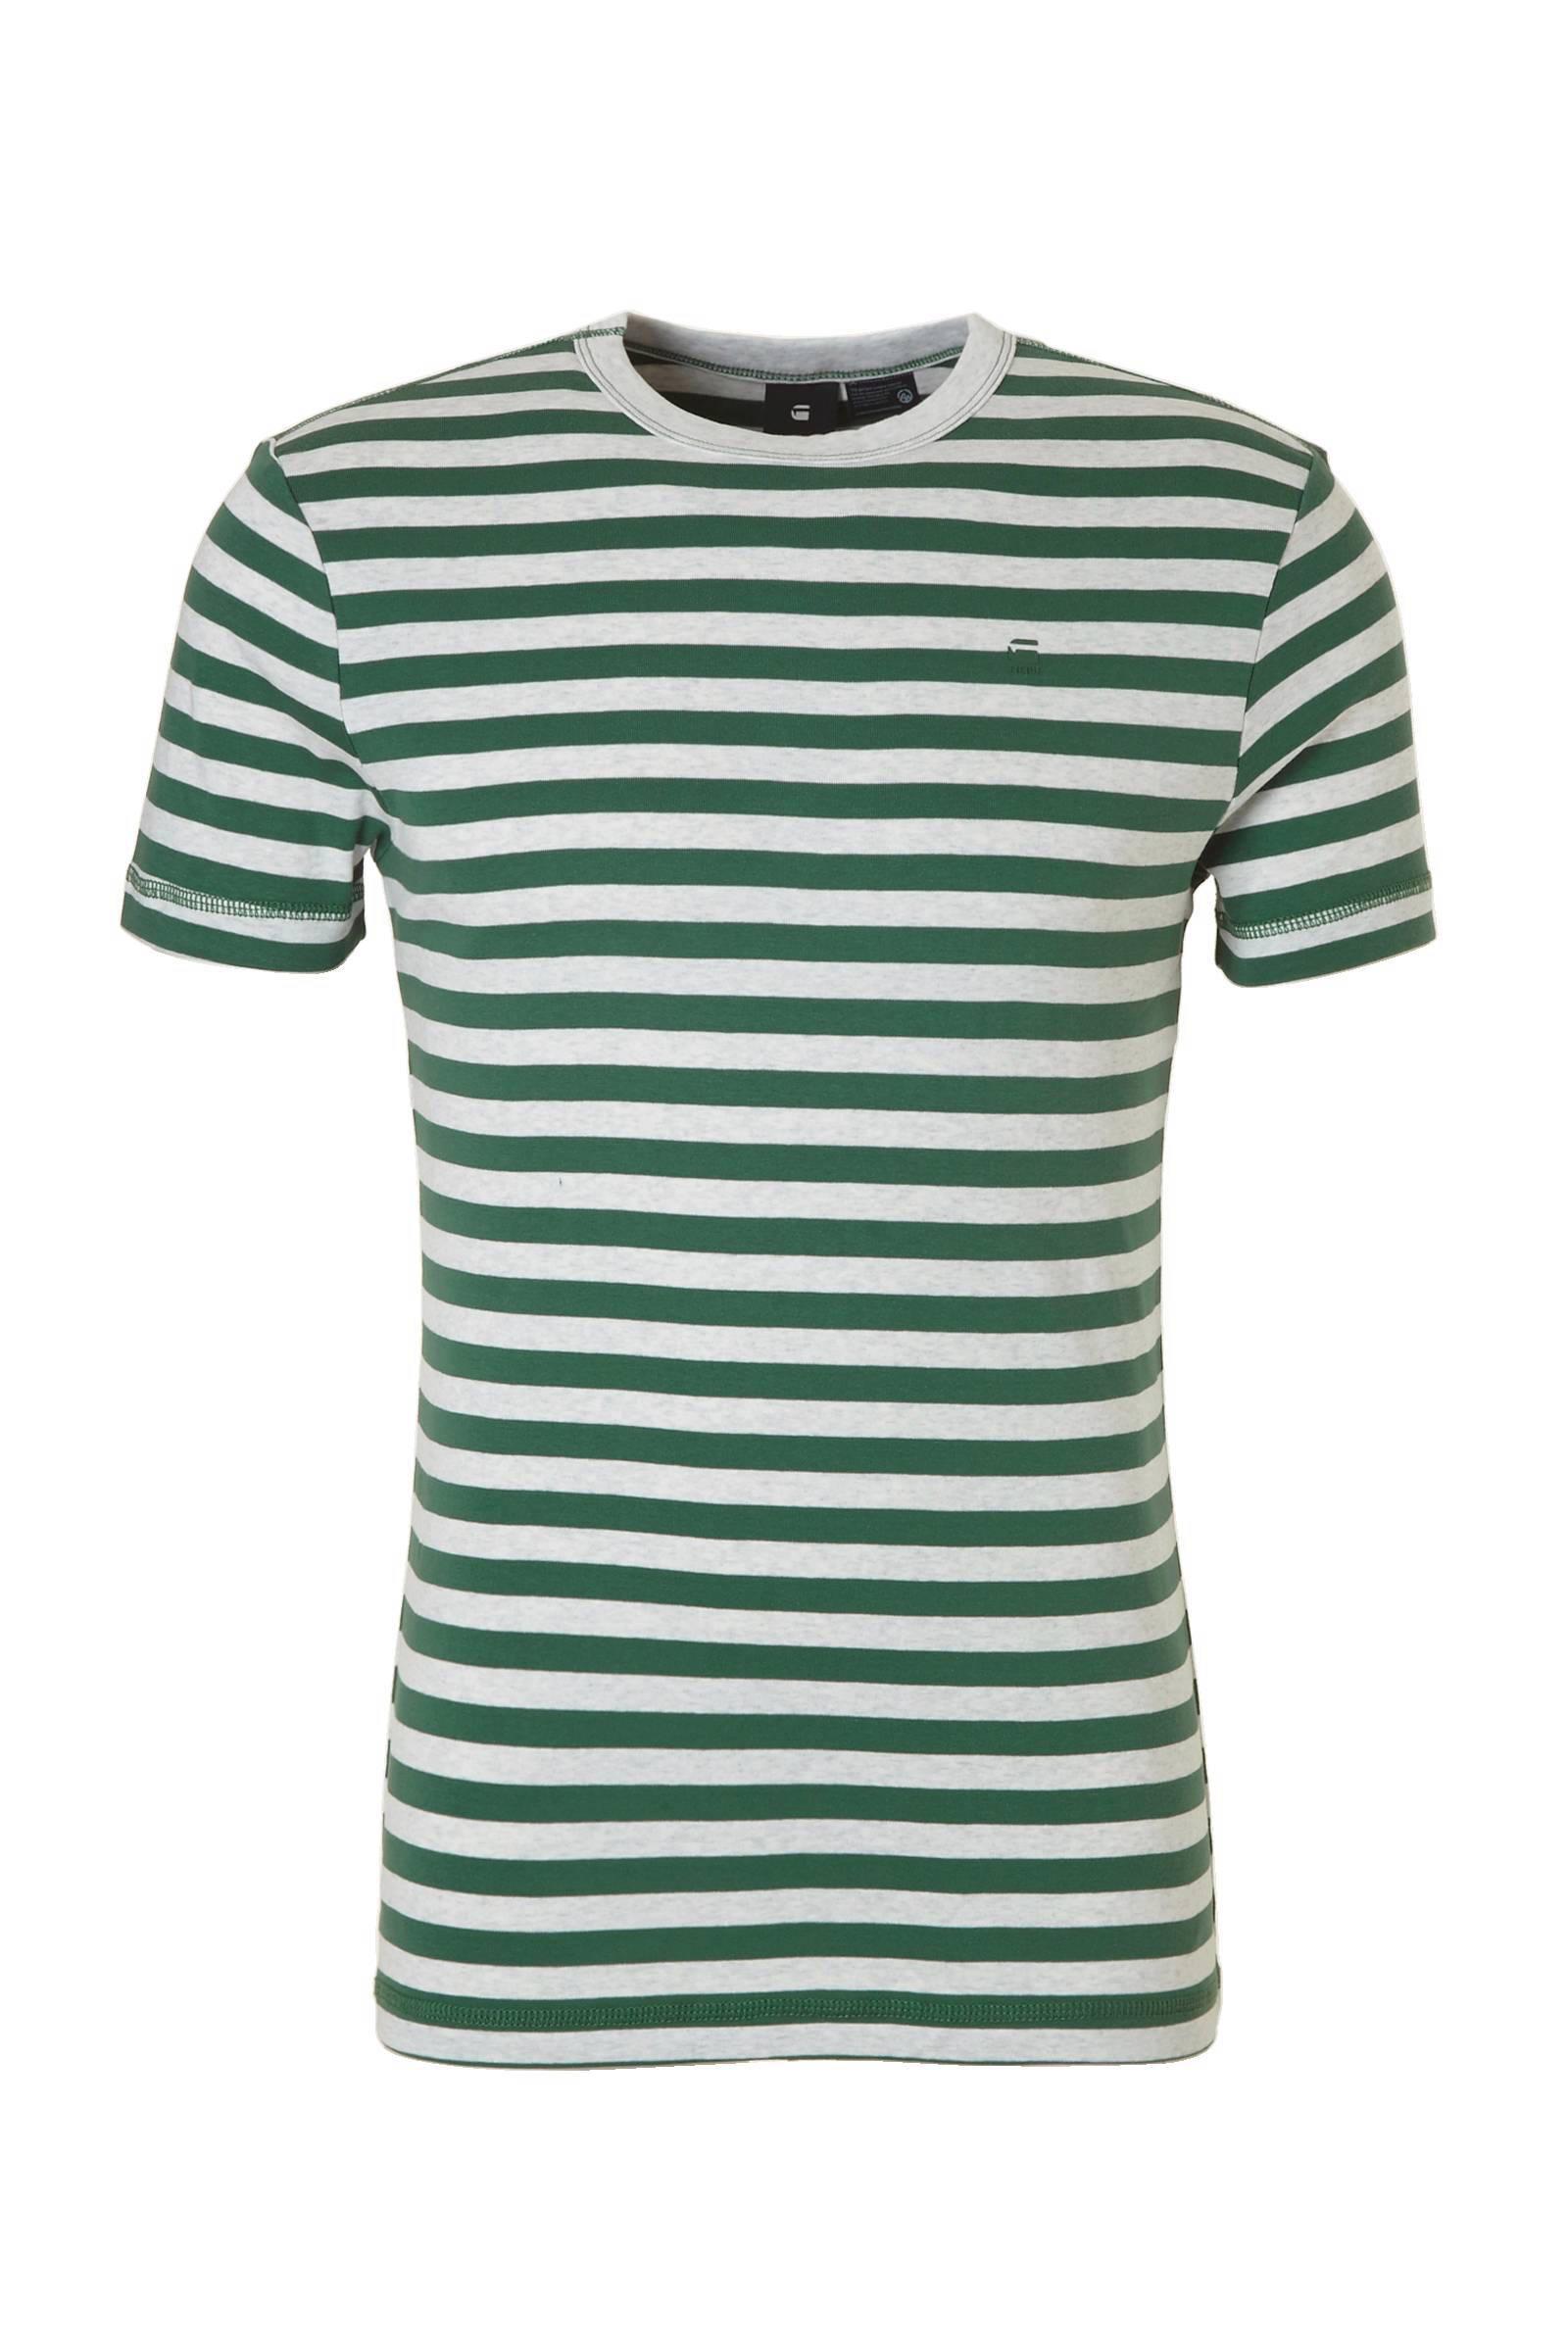 Cheap T Shirts Printing Online No Minimum Summer Cook